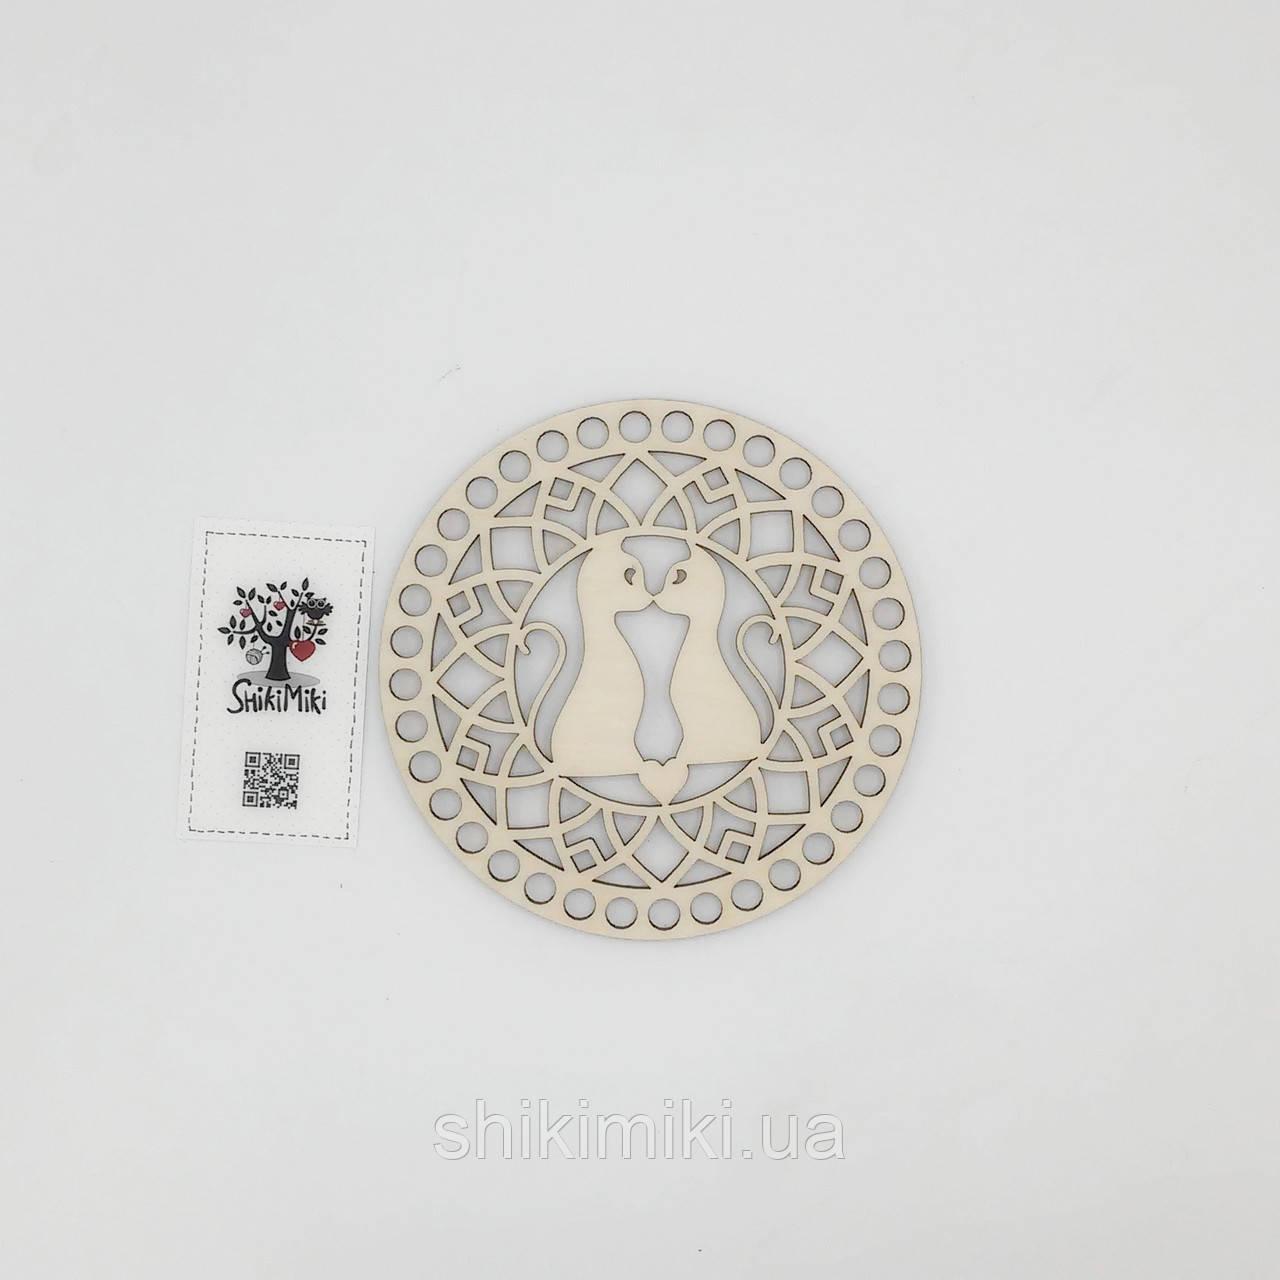 Заготовка из фанеры ажурная круглая -03 (15 см)